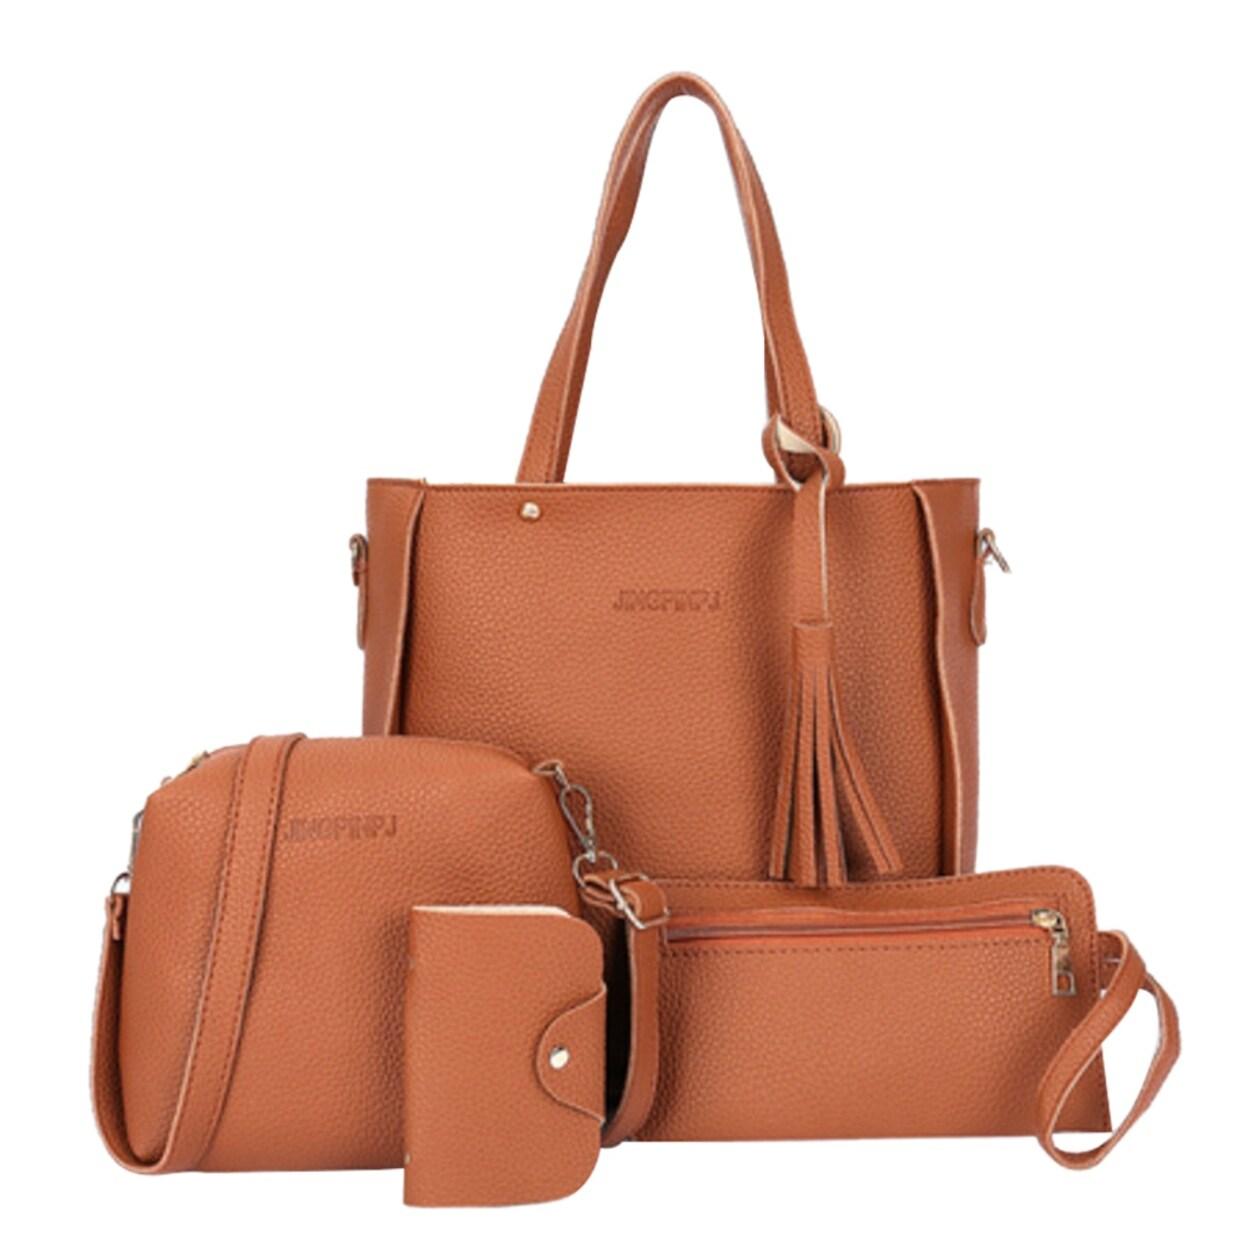 Women Fashion Vegan Leather Handbags+Shoulder Messenger Bag+Purse+Card Holder Package 4pcs Set Tote